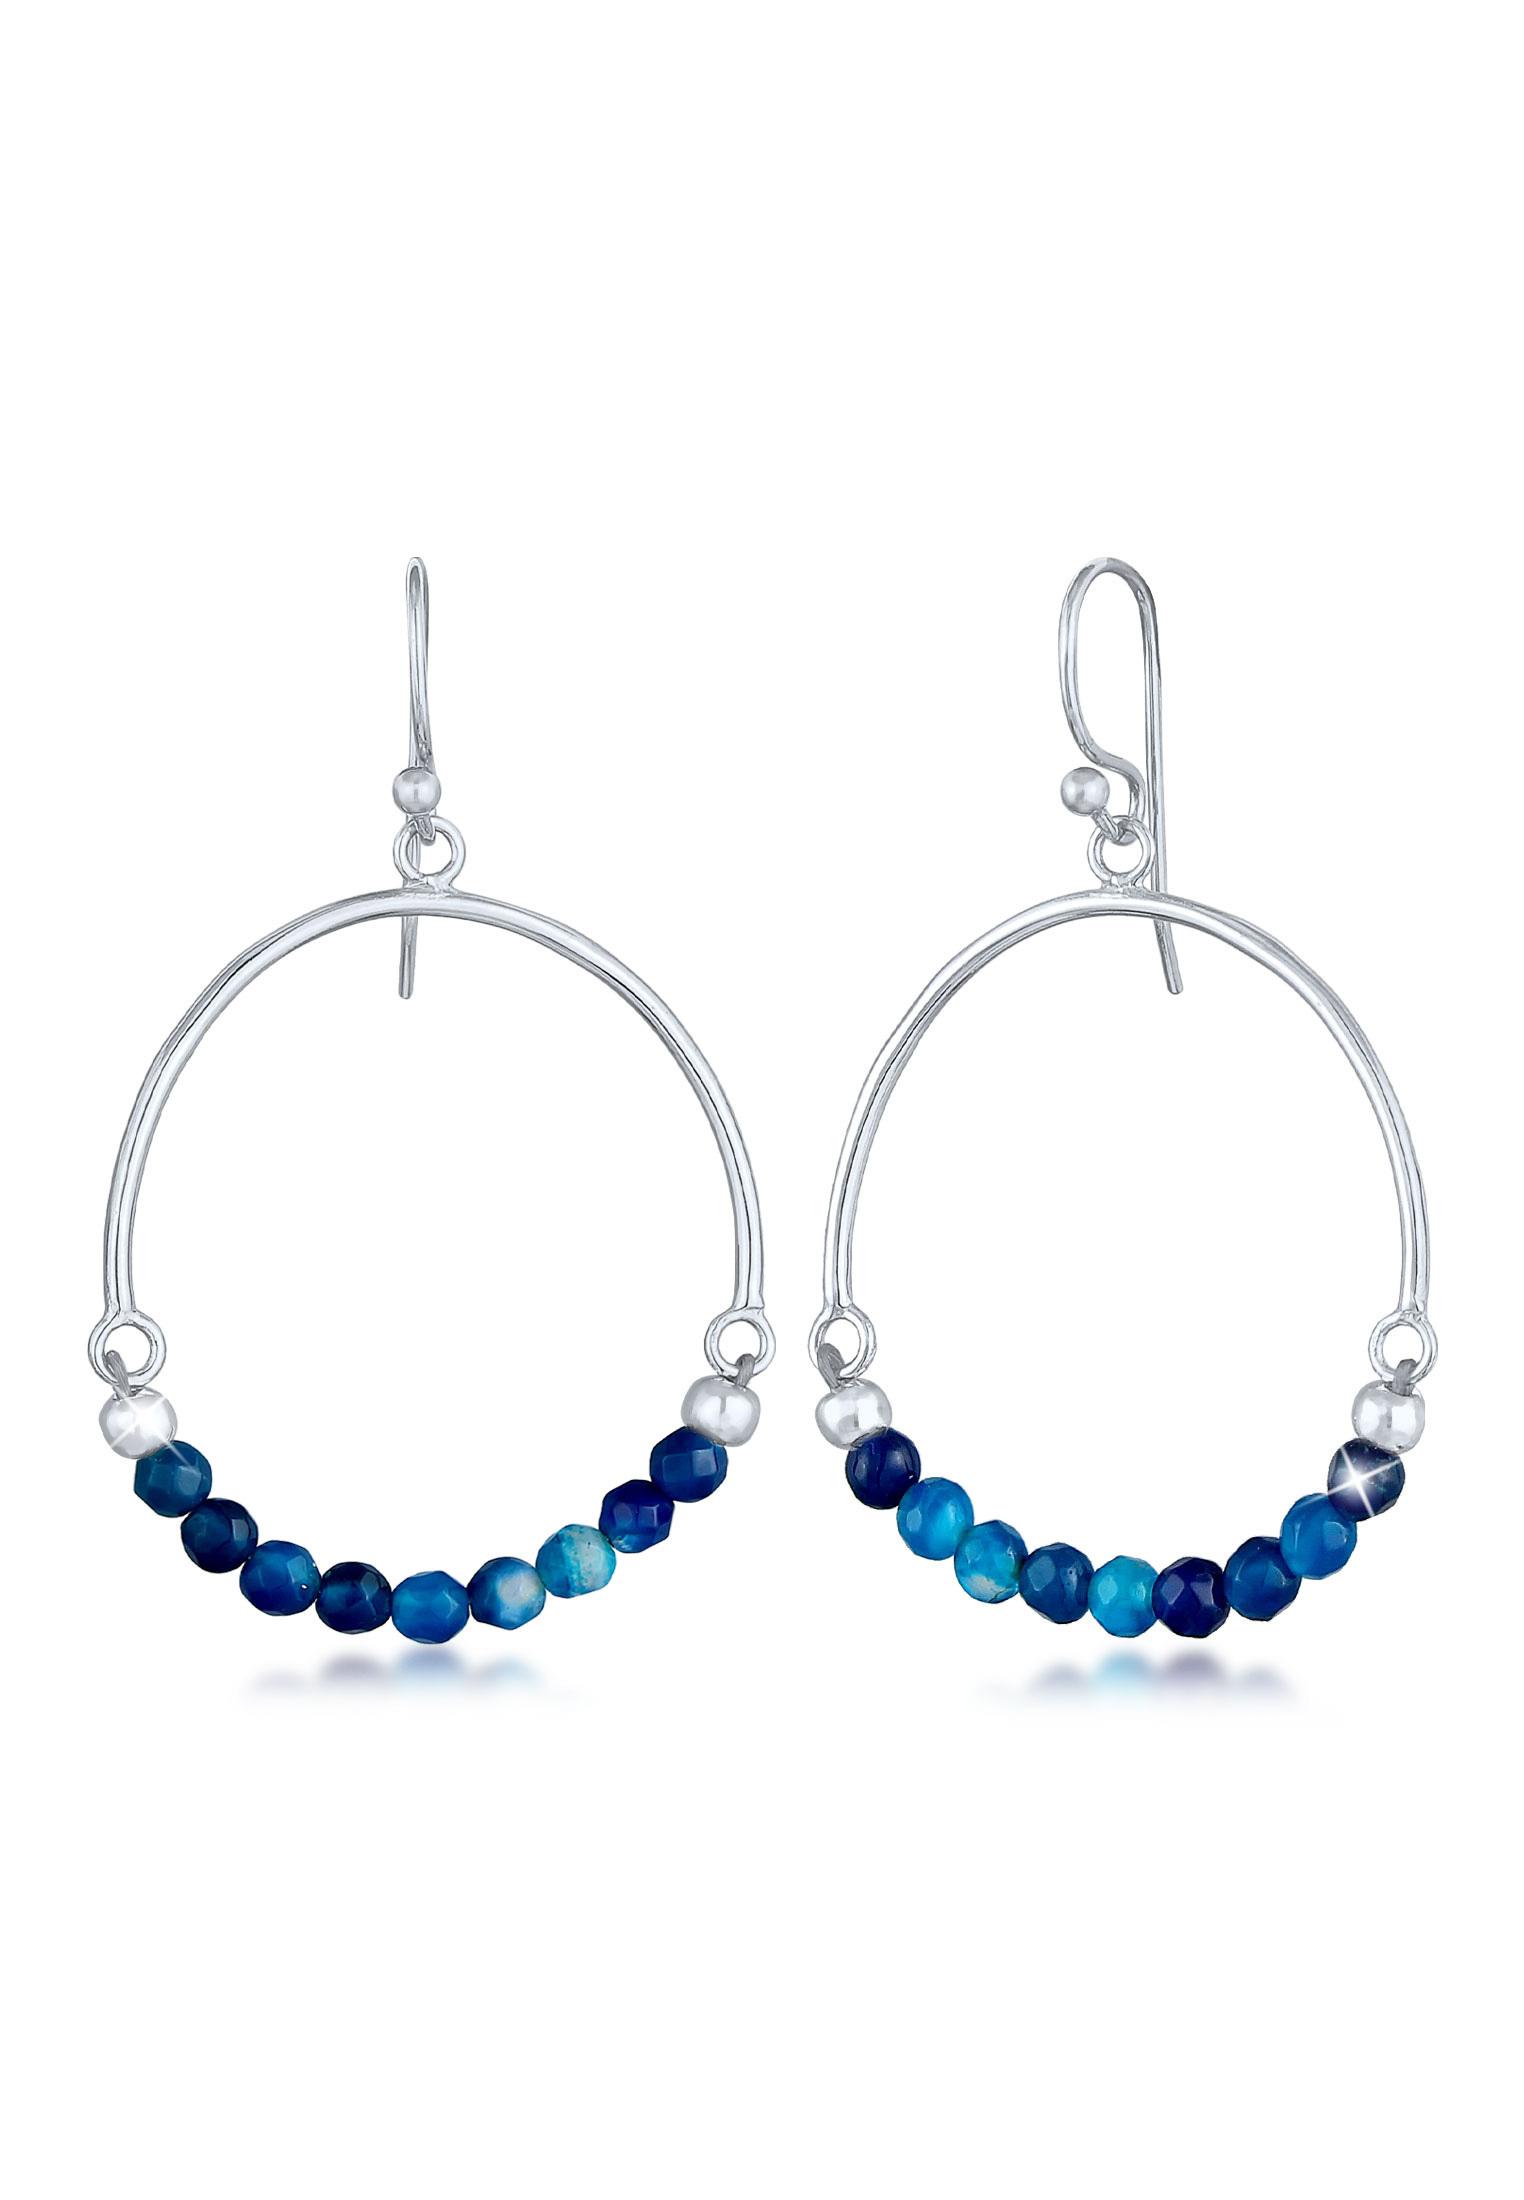 Ohrhänger | Achat ( Blau ) | 925er Sterling Silber